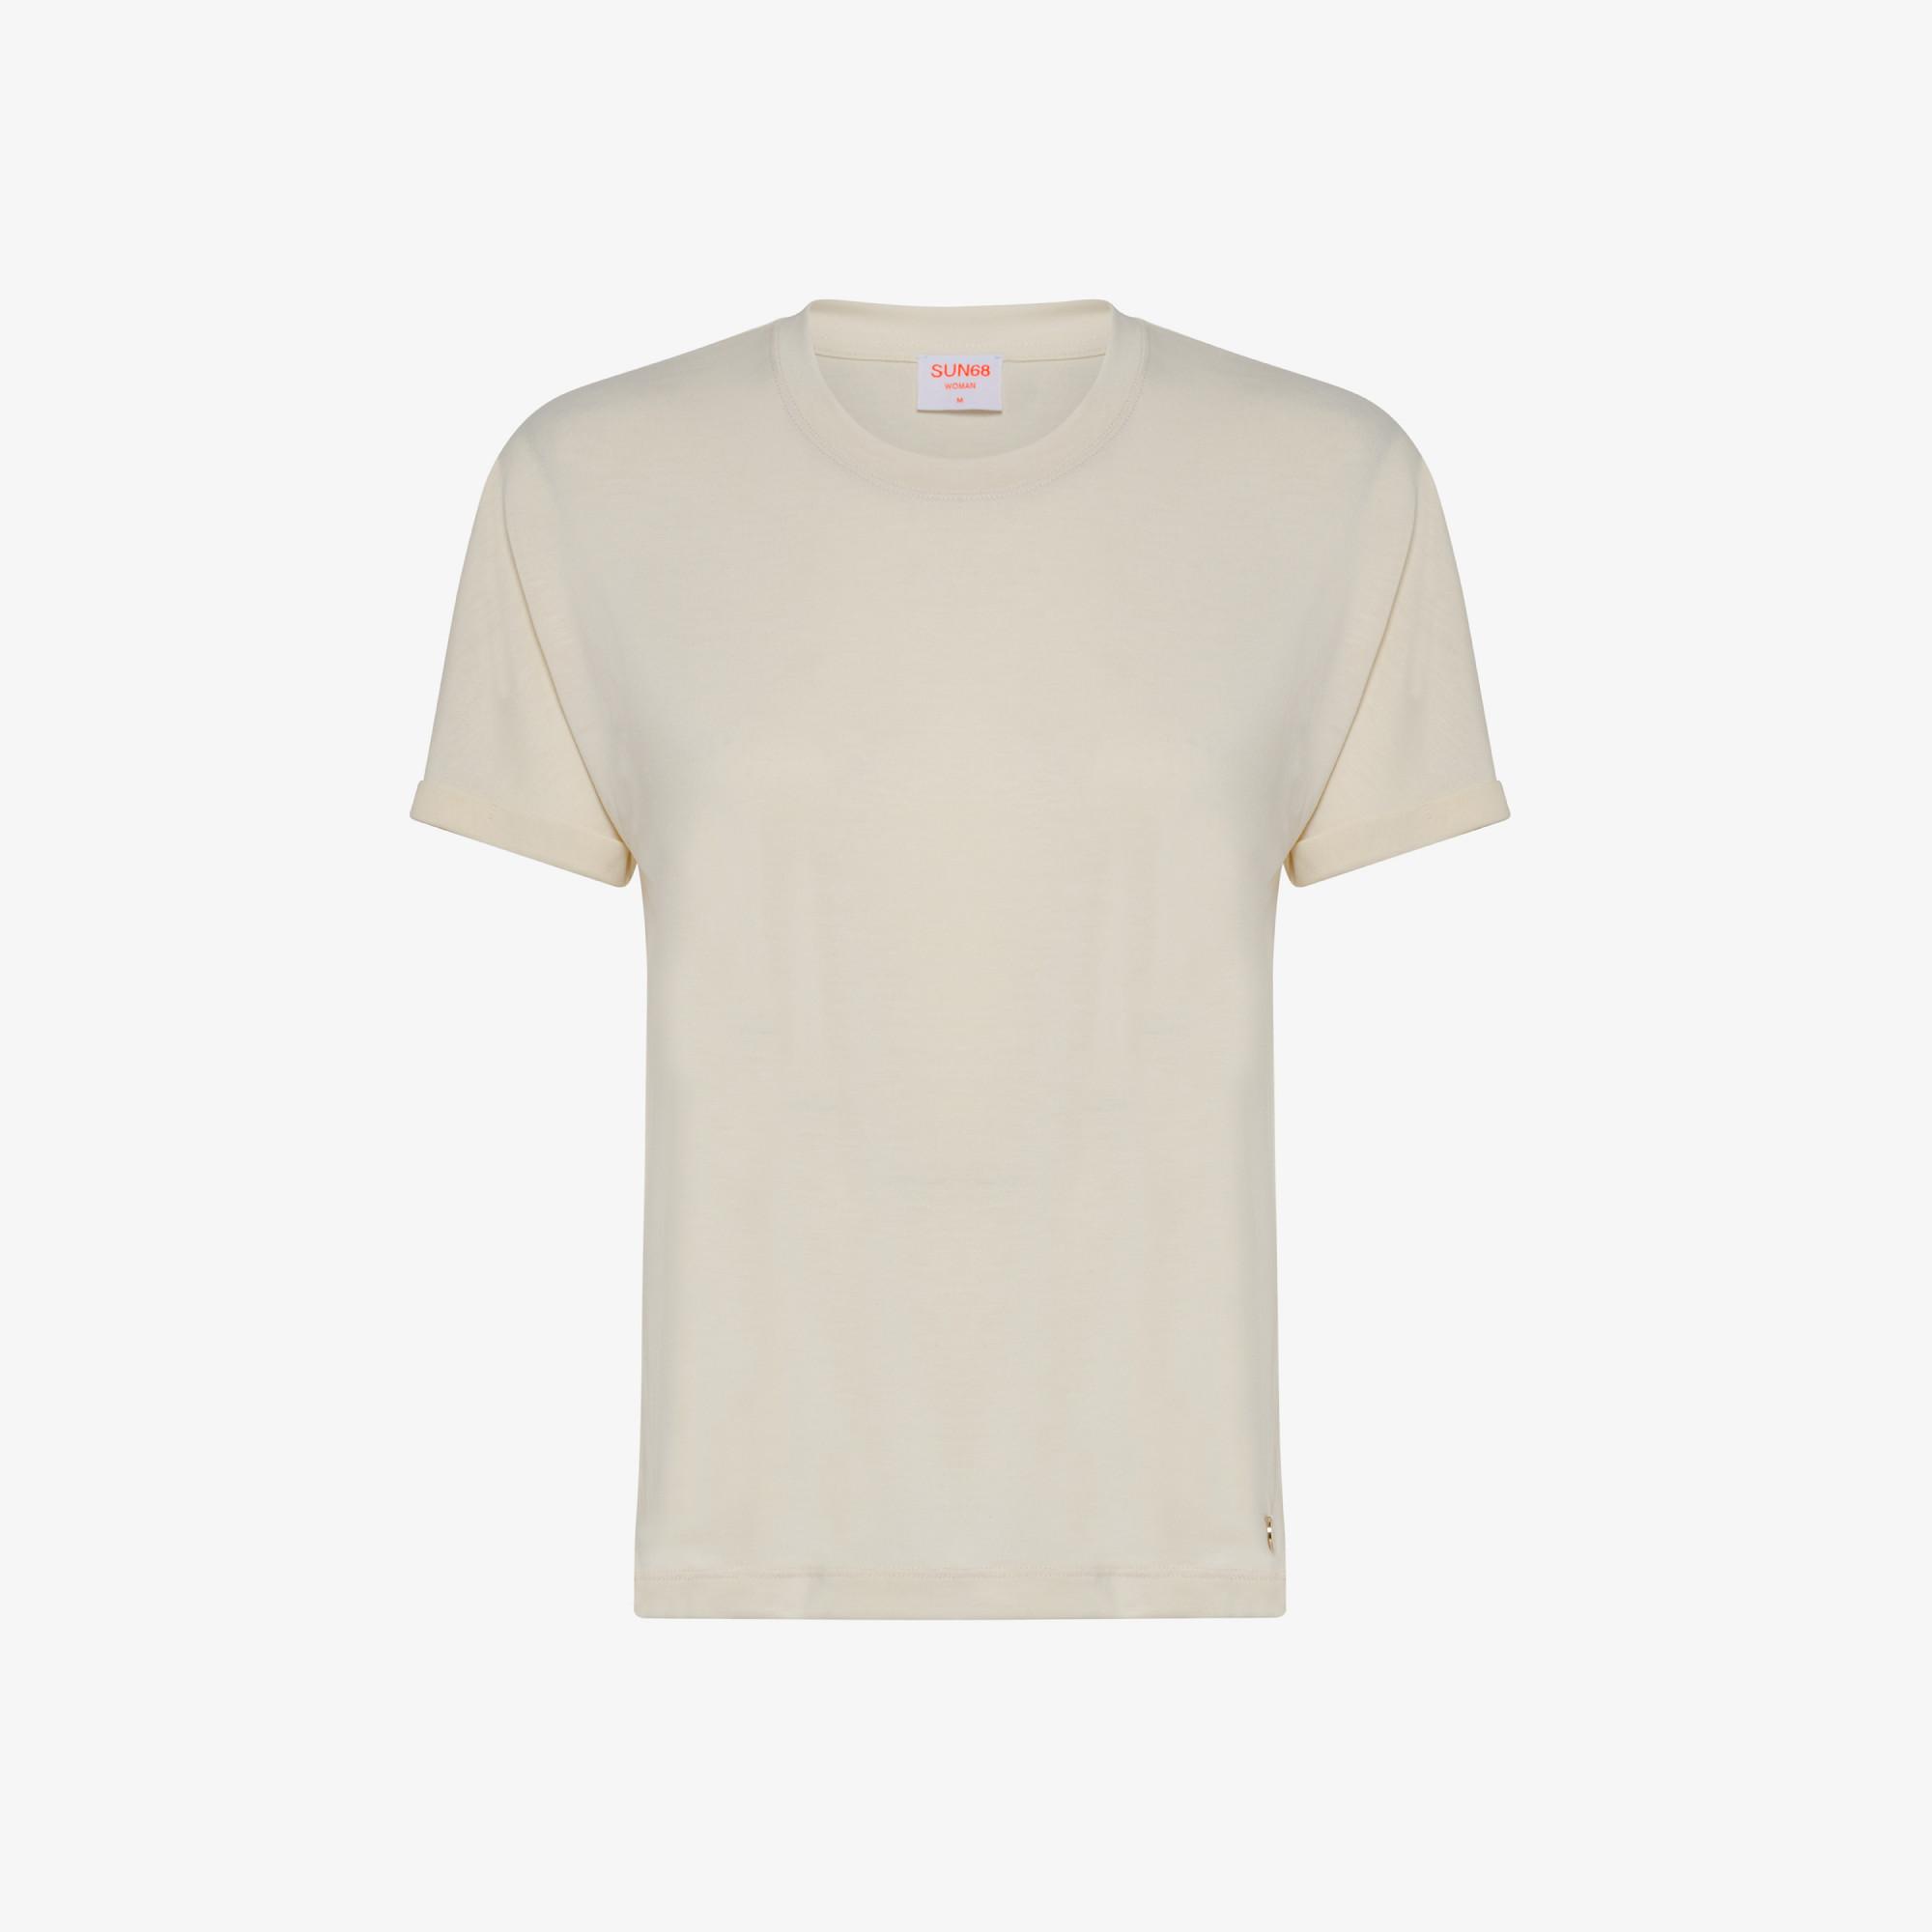 ROUND NECK T-SHIRT SHINY S/S PORCELAIN